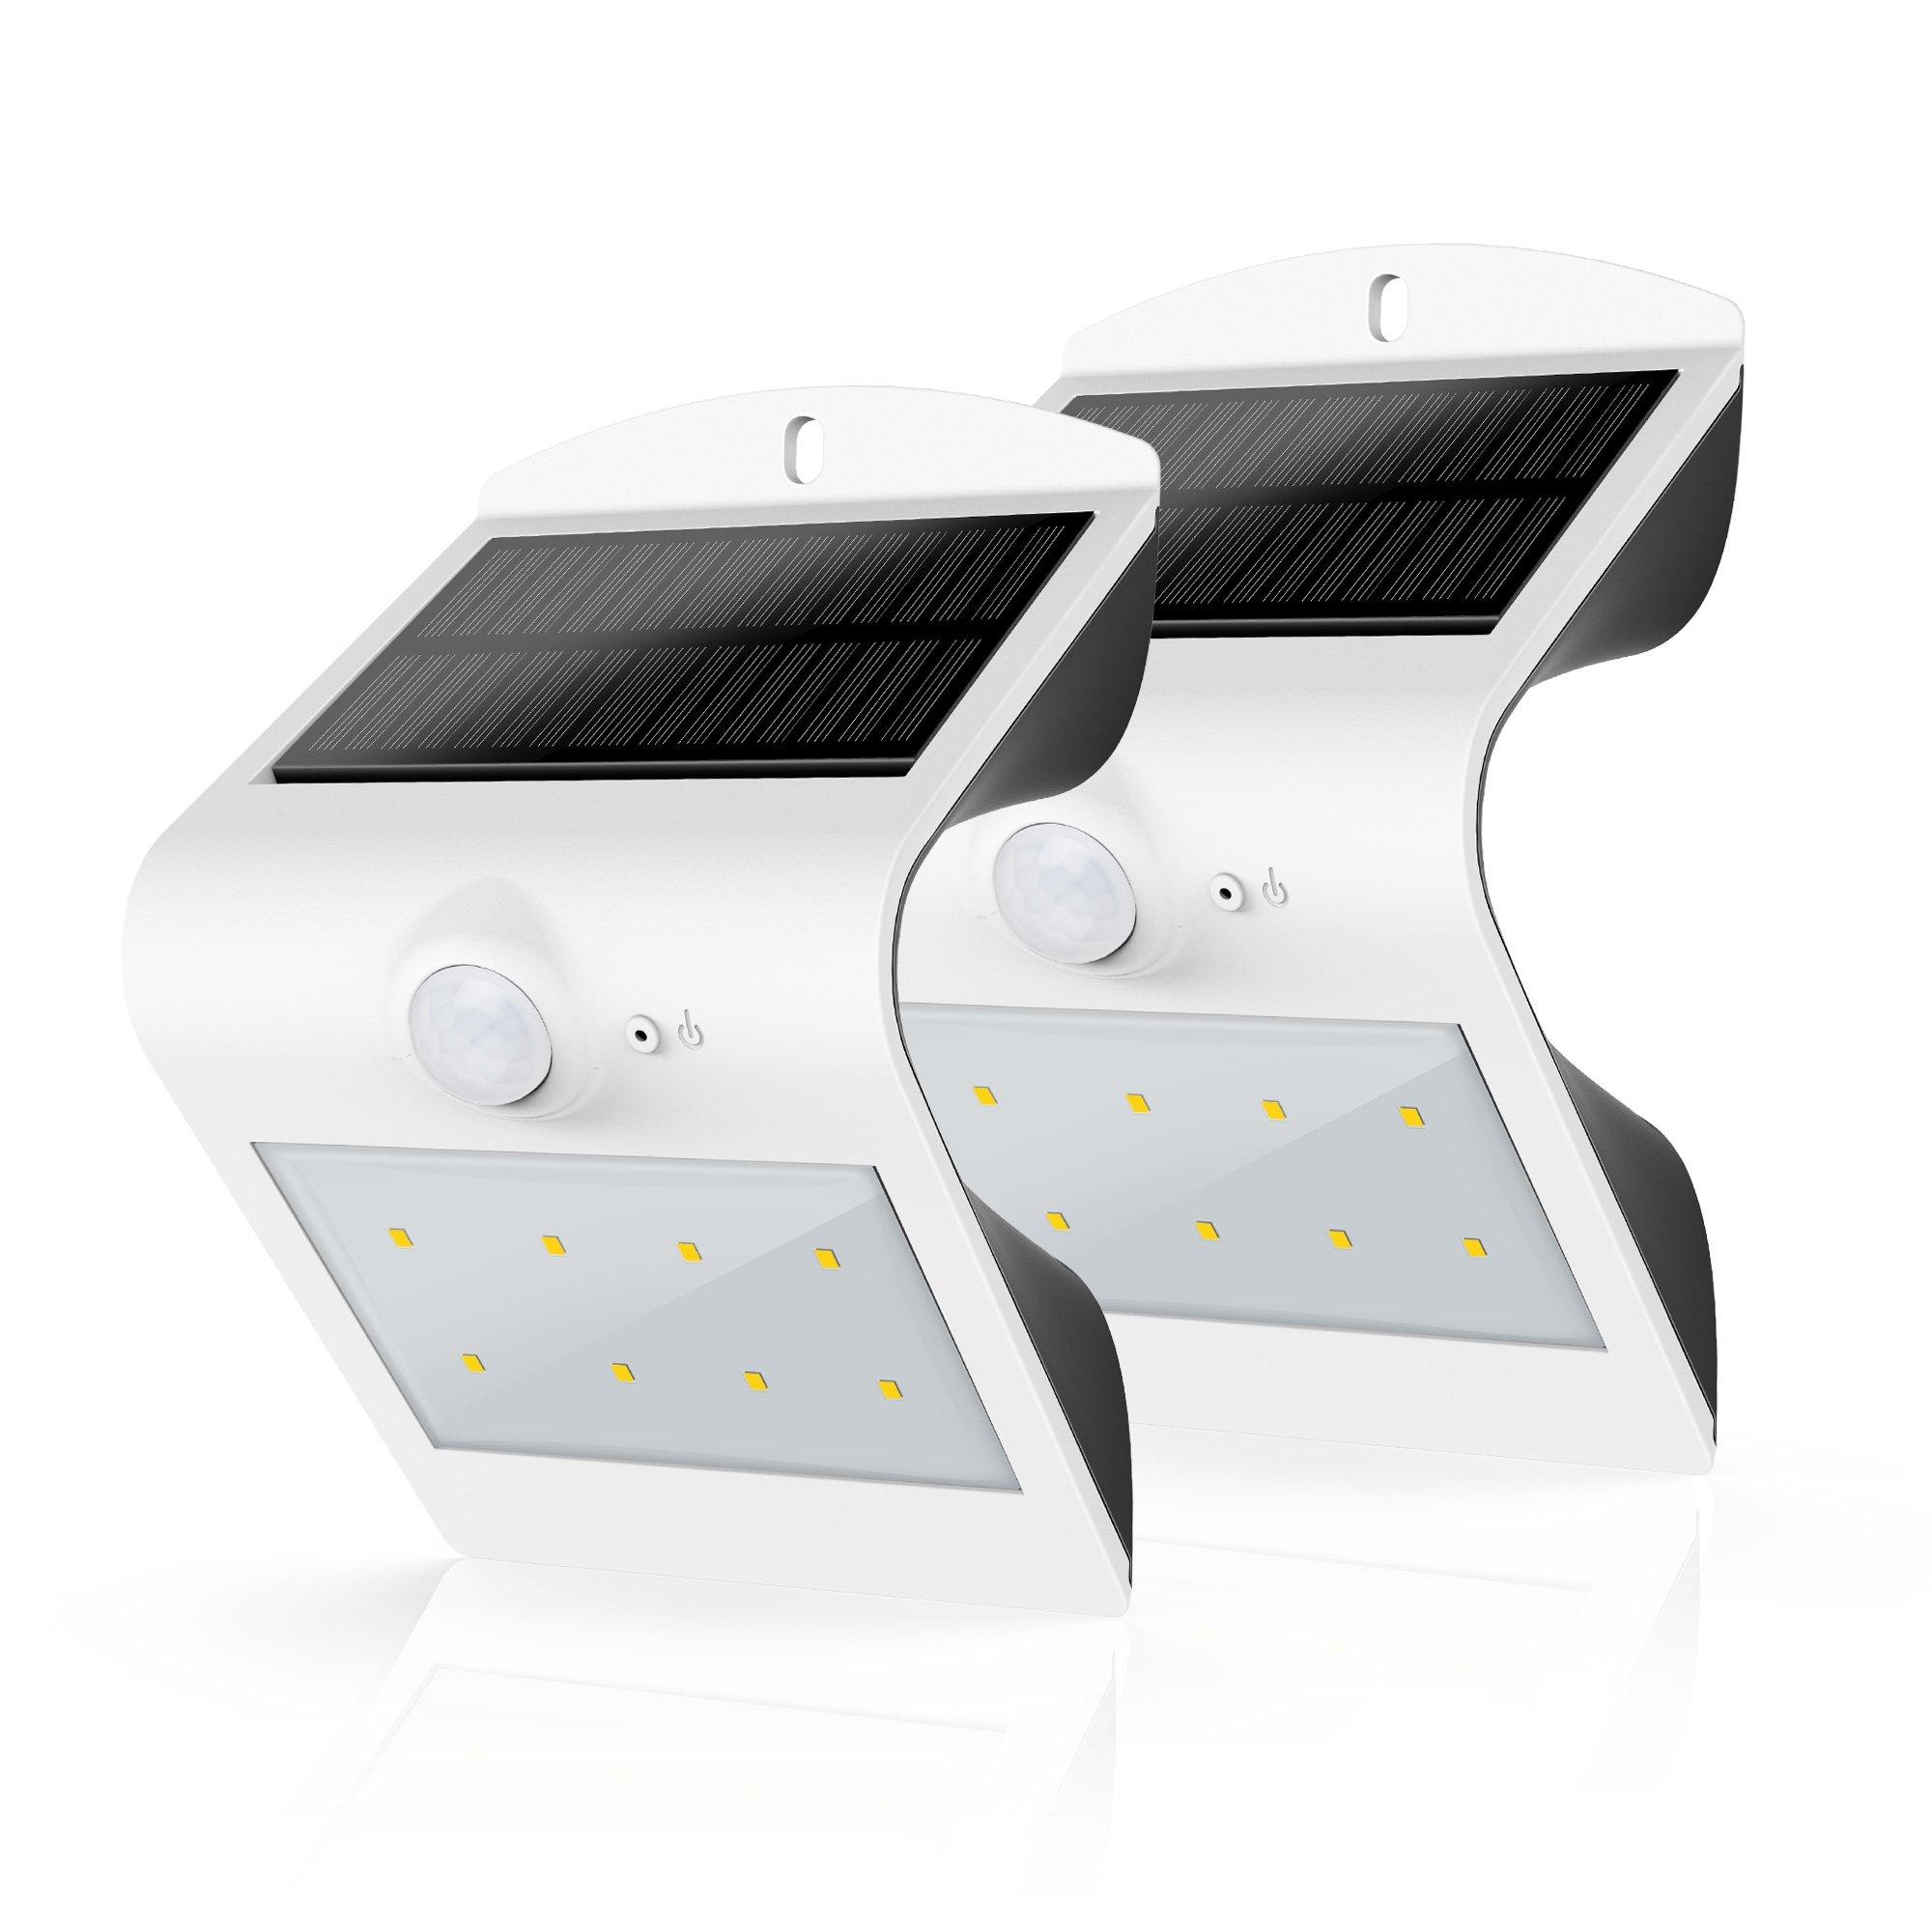 Honesteast Solar Lights Outdoor Security Lighting Solar ...